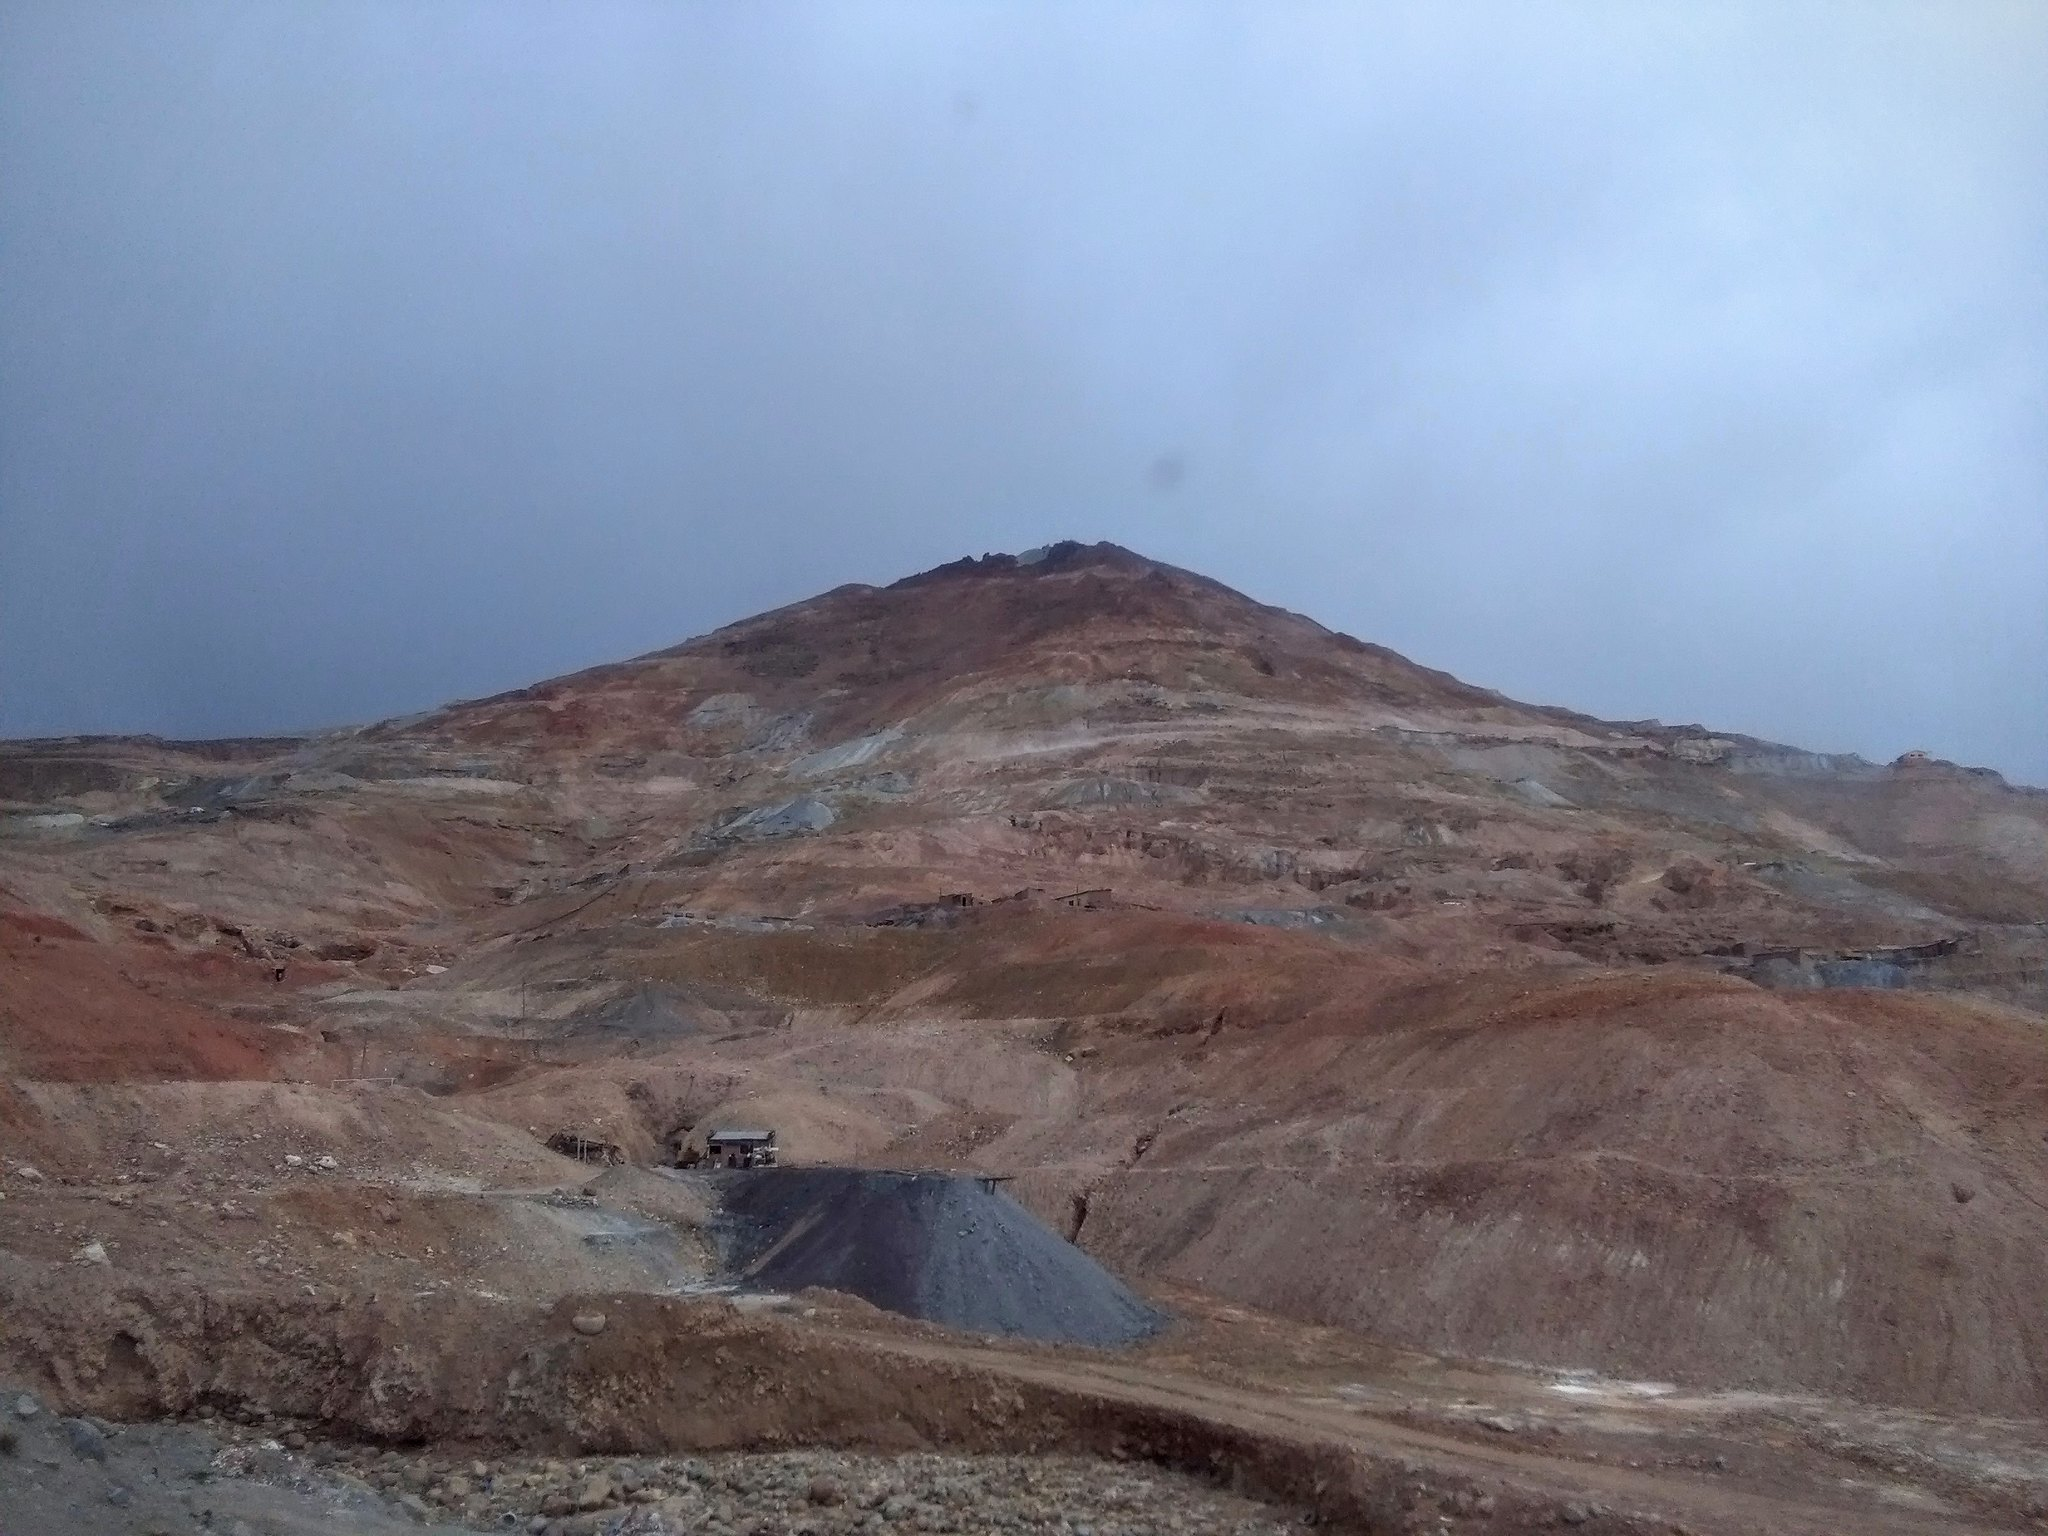 Cerro Rico against the gray sky